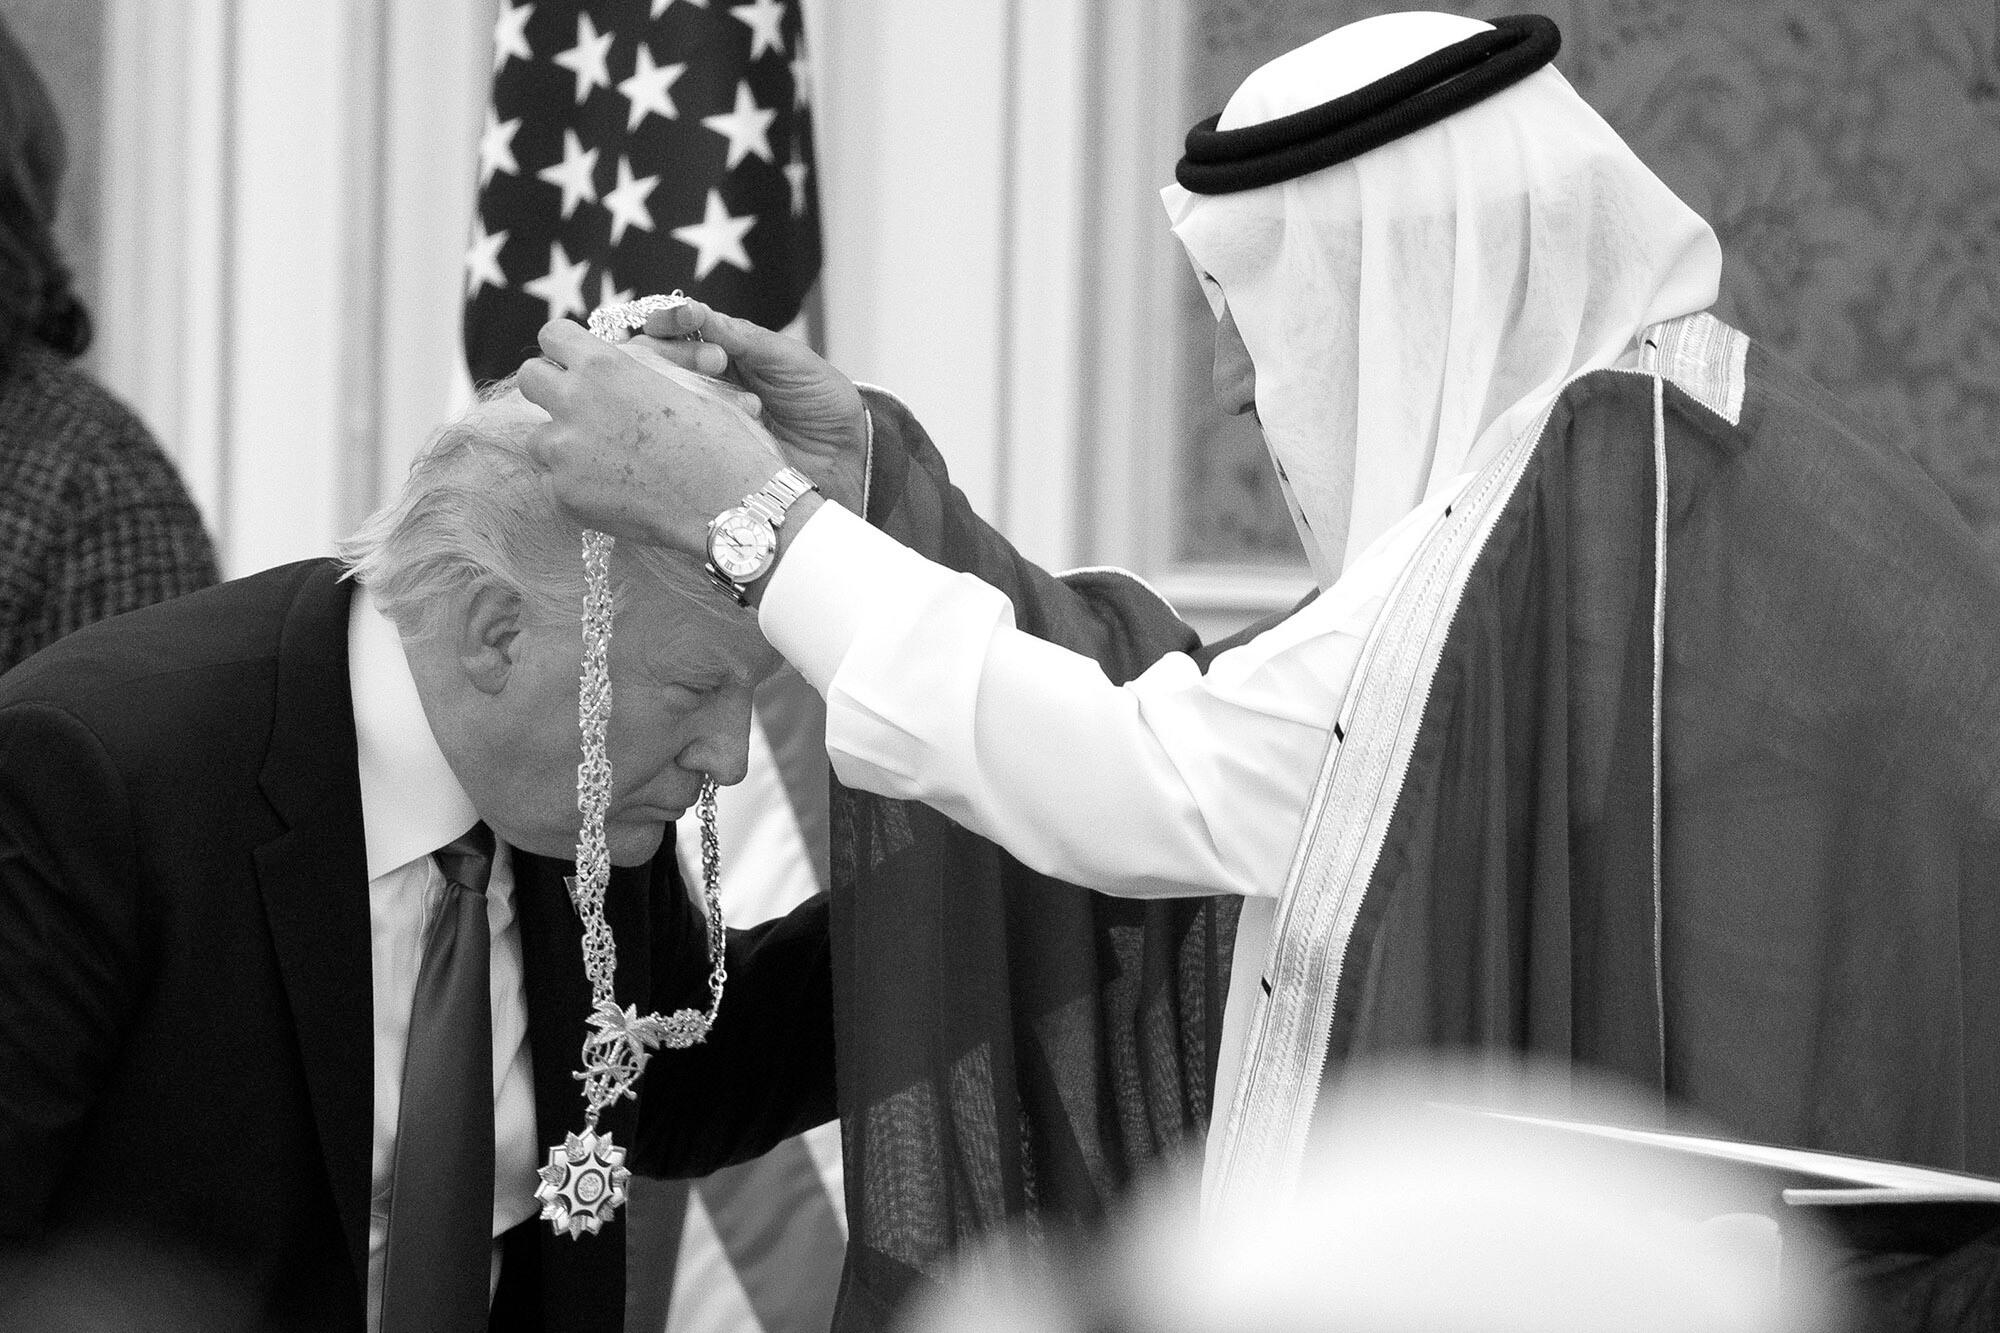 Saudi King Salman presented President Donald Trump with the highest civilian honor, the Collar of Abdulaziz Al Saud, at the Royal Court Palace, in Riyadh. President Trump bragged about having protected the Saudi crown prince, Mohammed bin Salman, after the brutal killing of Washington Post journalist Jamal Khashoggi.